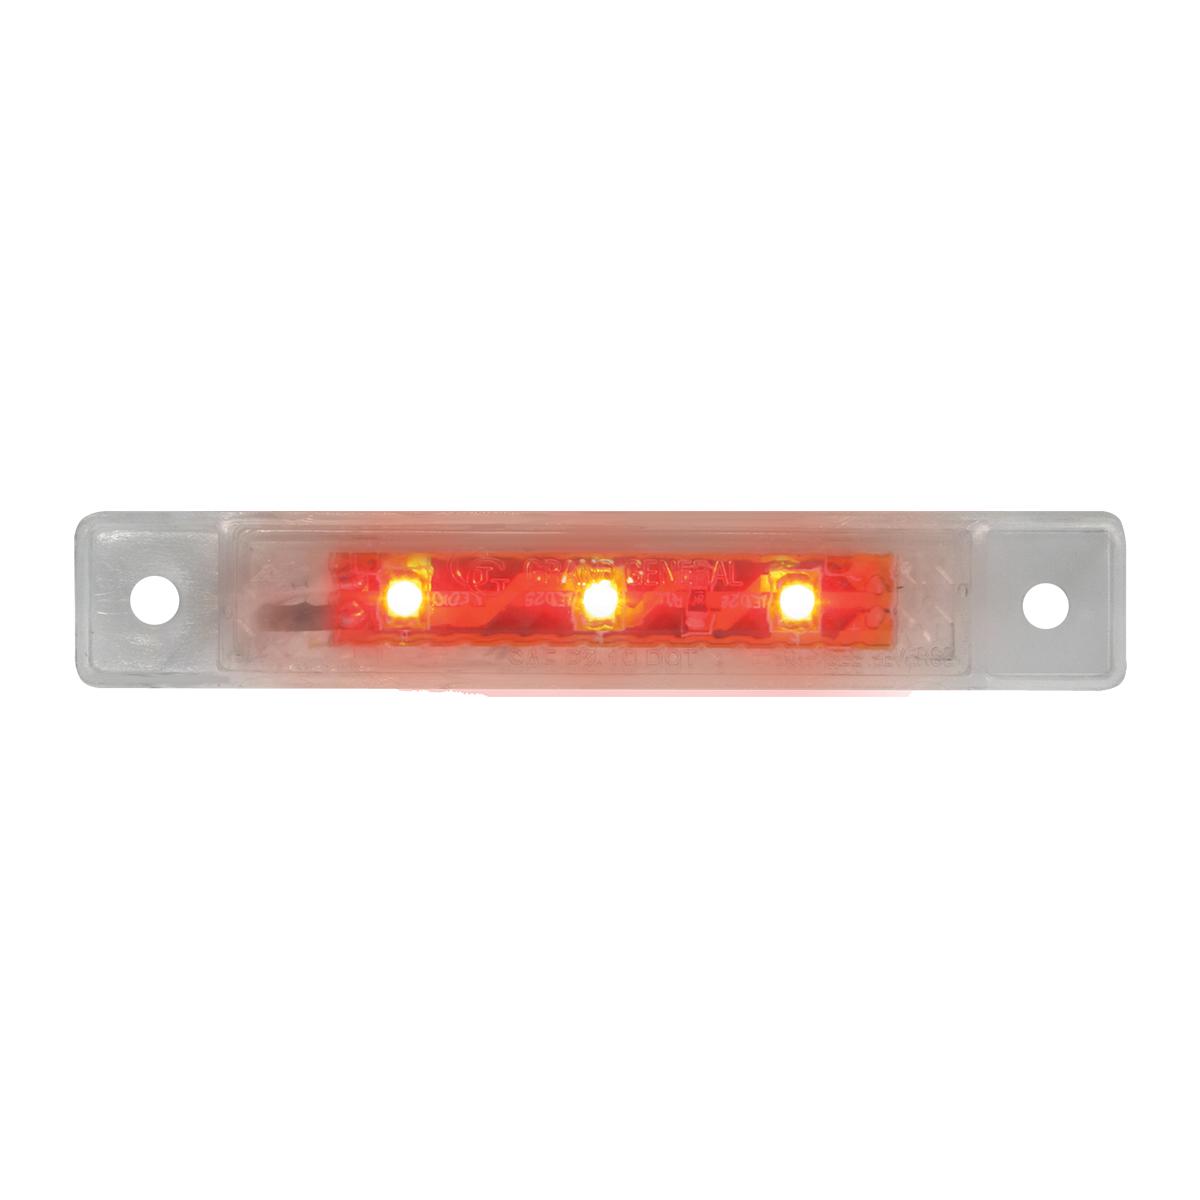 "76283 3.5"" Ultra Thin LED Marker Light"